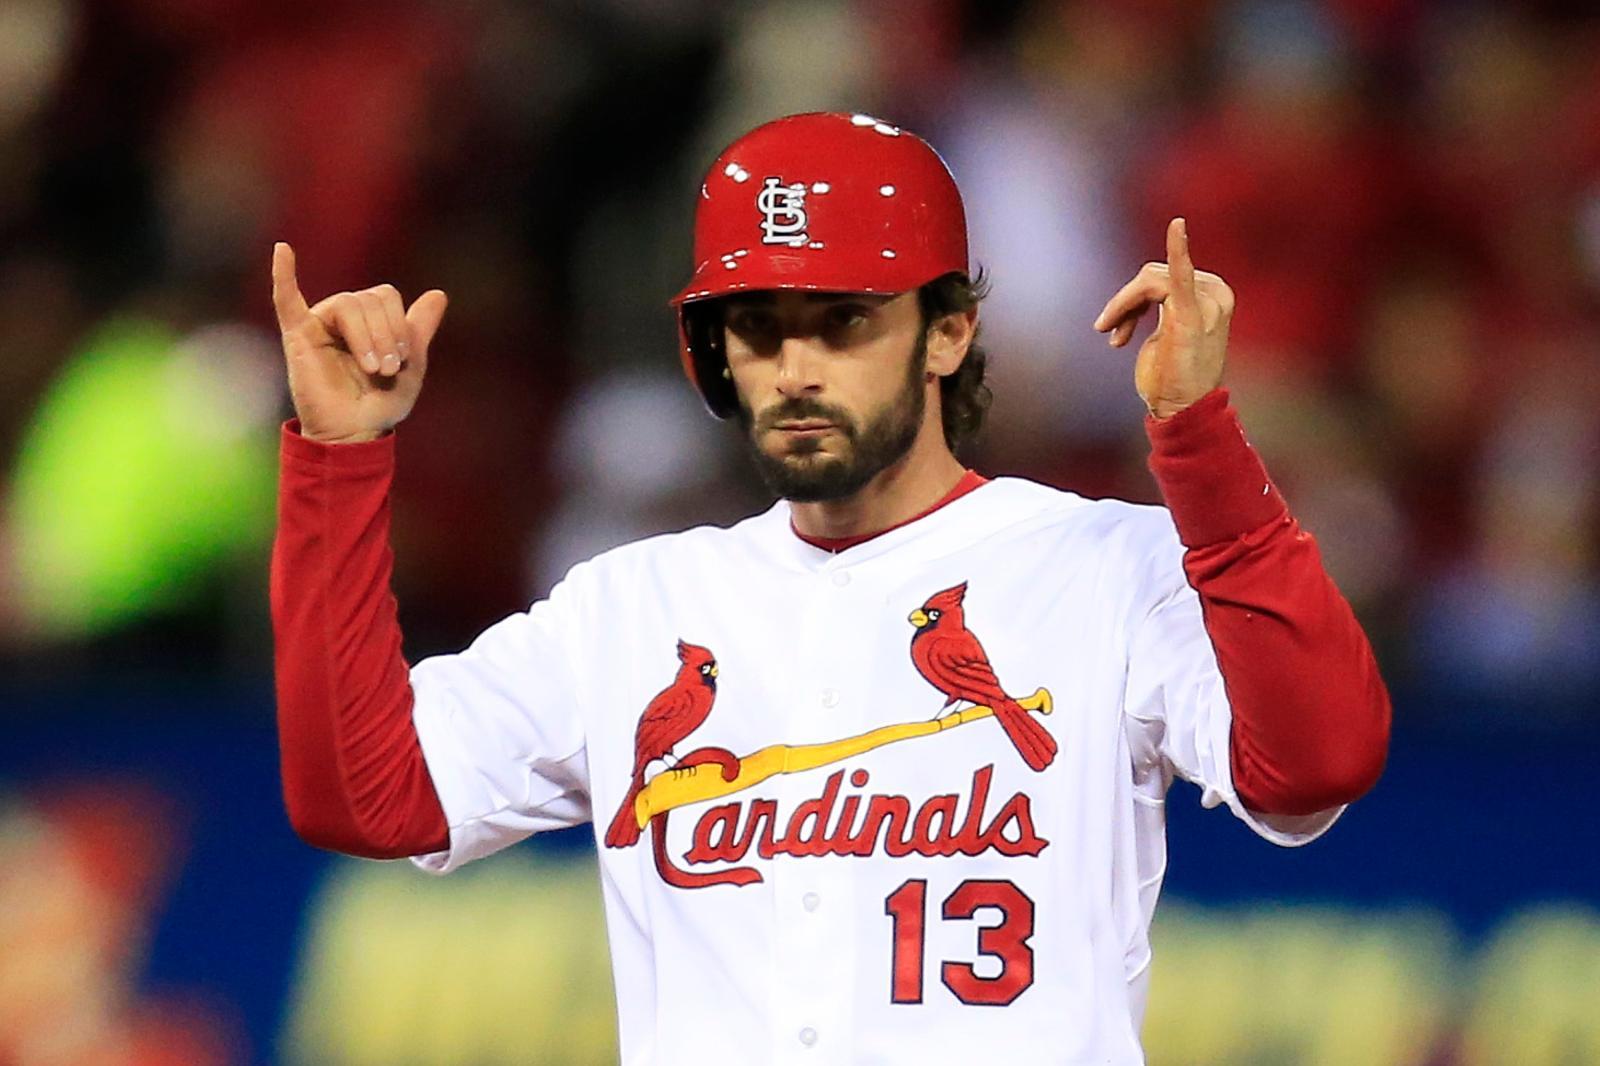 Fantasy Baseball Tips and Tricks: The Value of Versatility